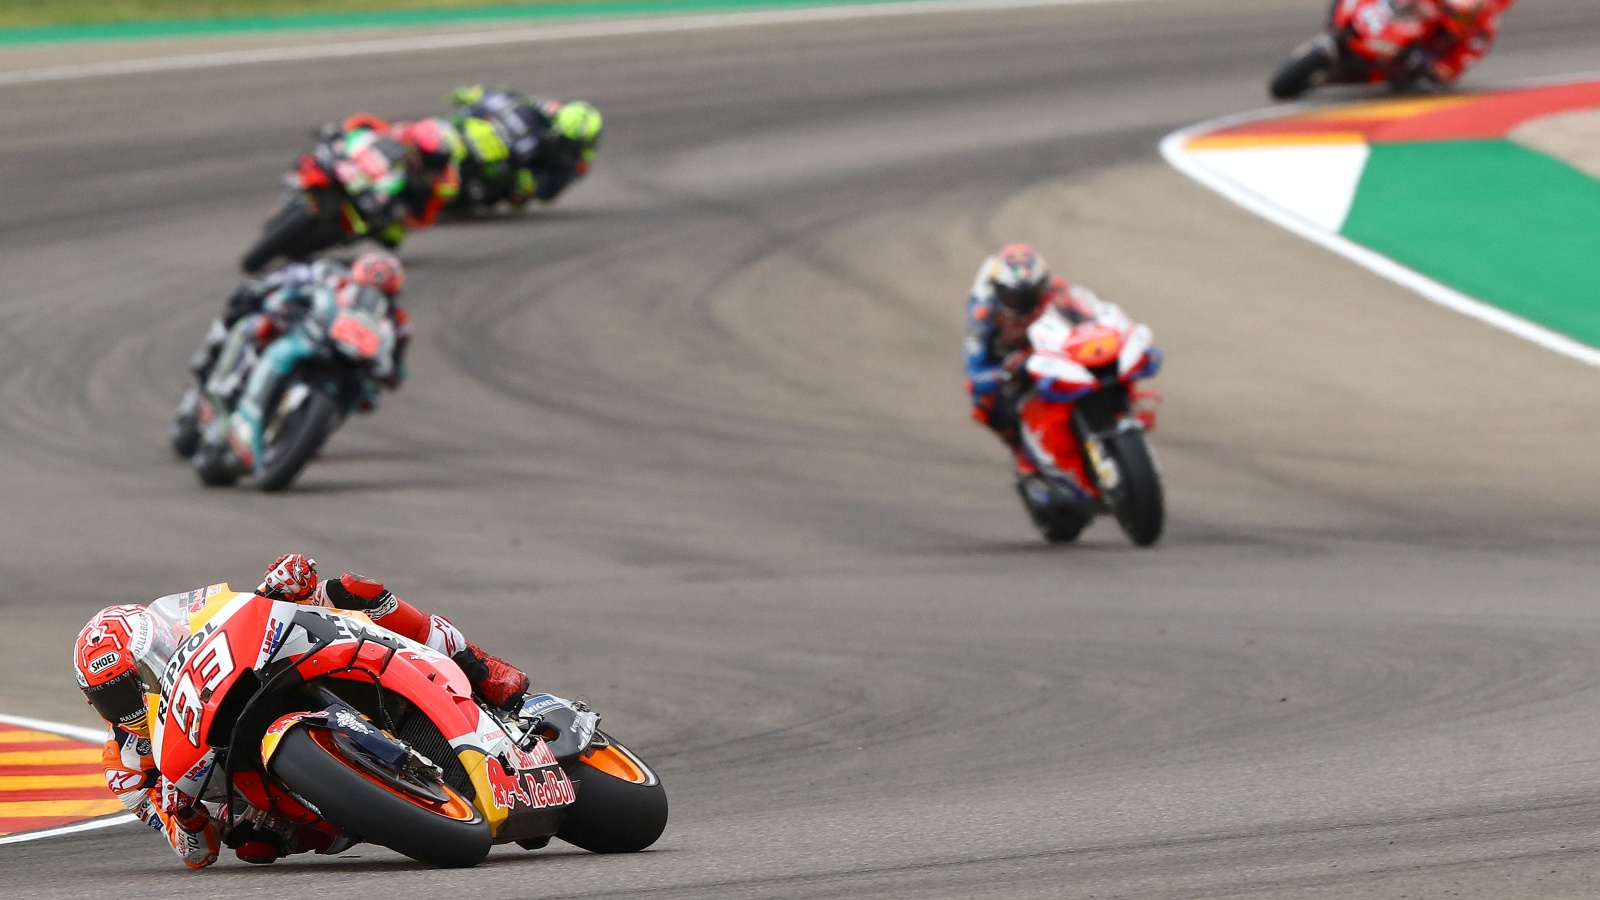 Marc Márquez suma 325 puntos. ¿Cuántos equipos suman más puntos contando a sus dos pilotos?